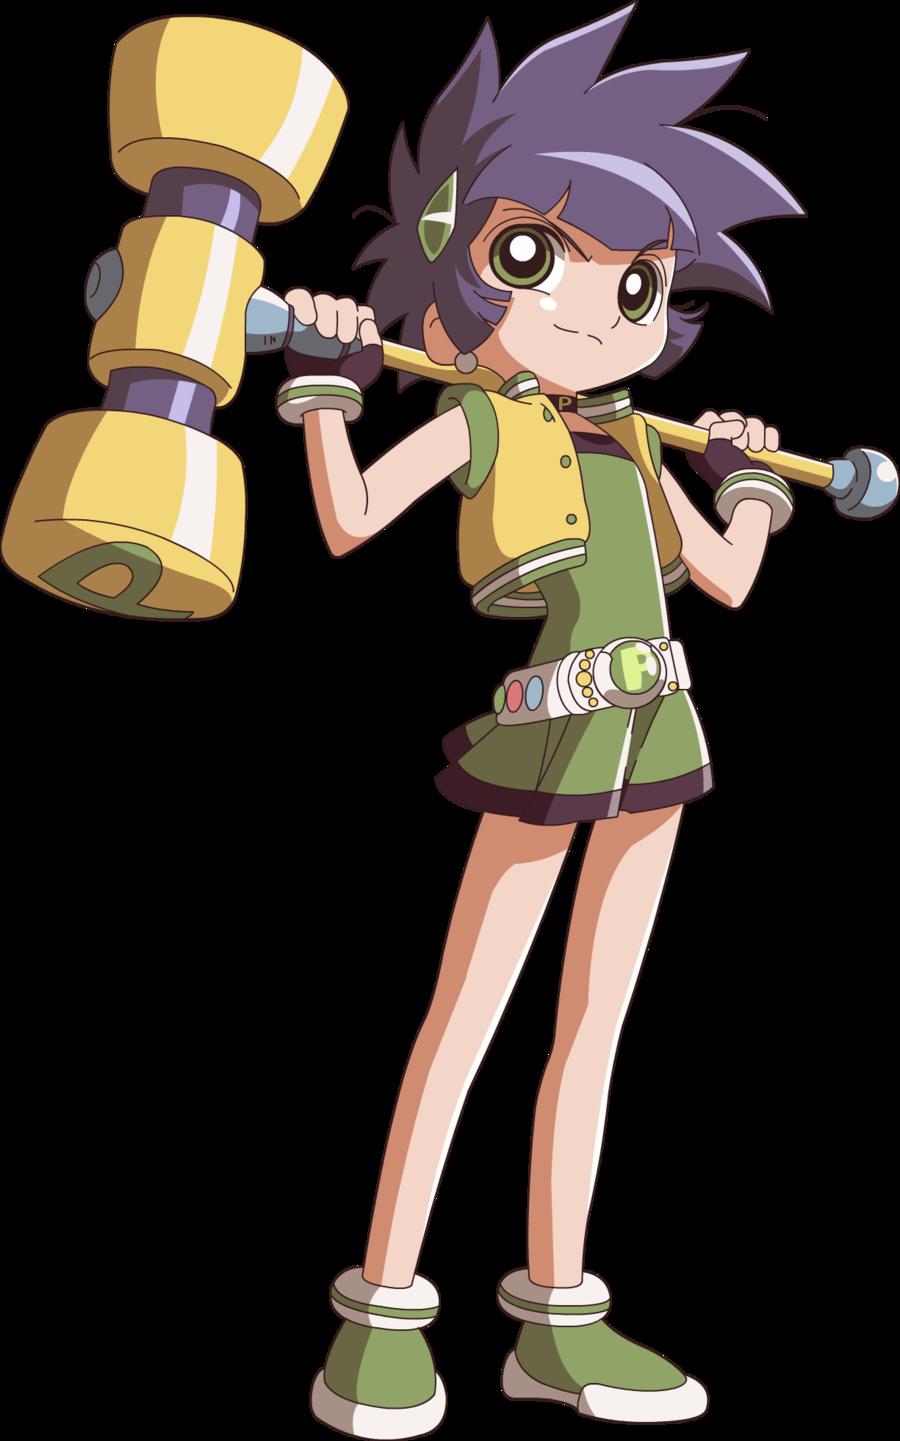 powerpuff girls z Google Search Powerpuff girls anime